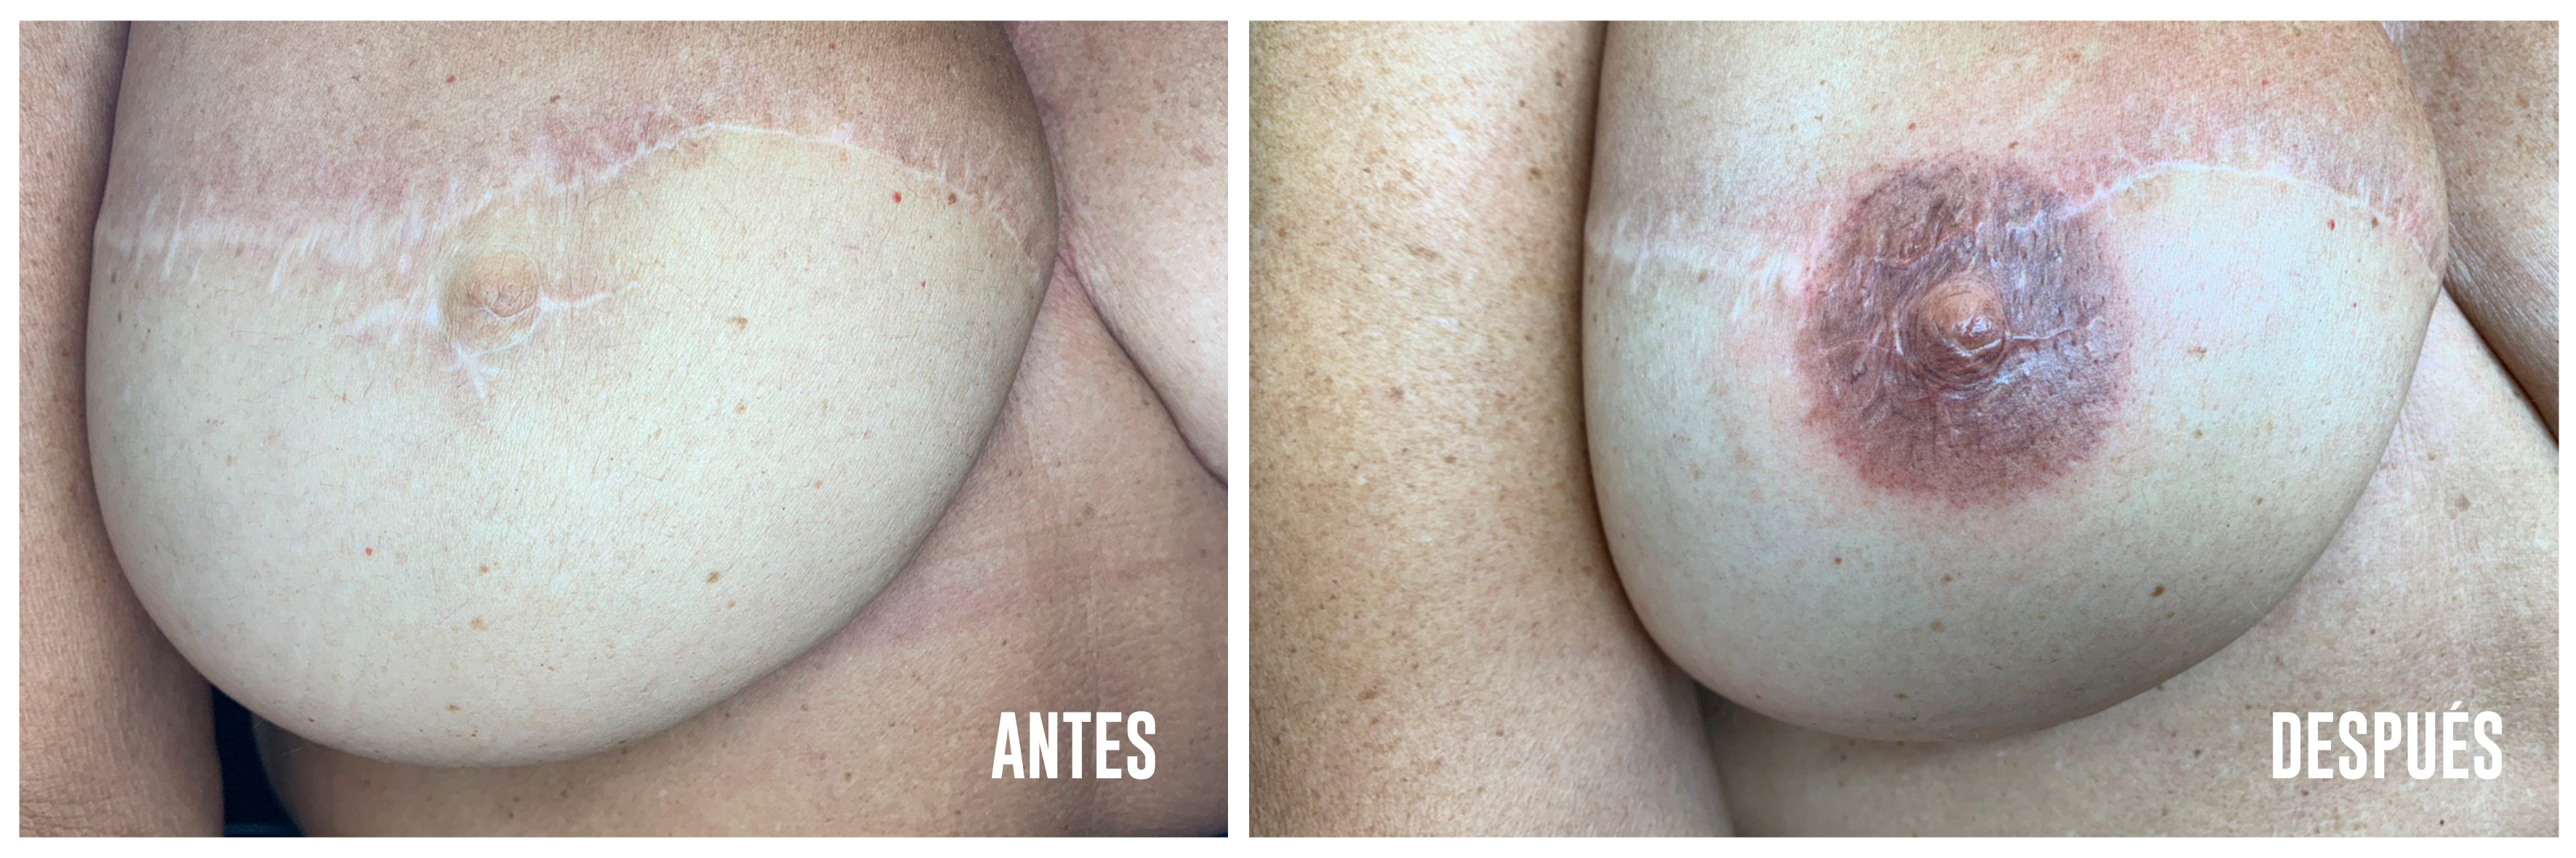 Antes-después tatuaje areolas pezon - Logia Barcelona